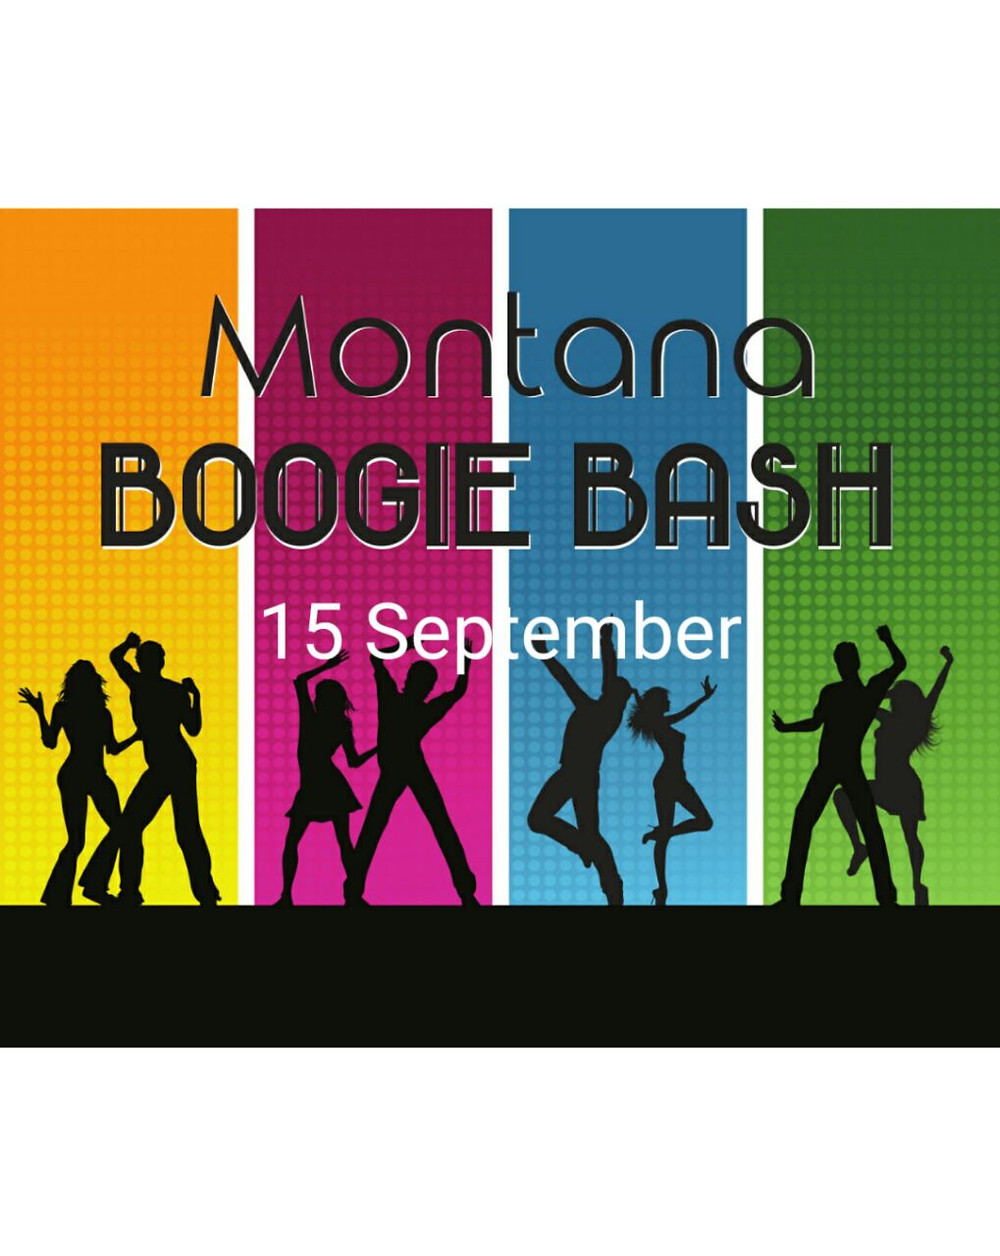 Contact Mercia for Montana's next Dance 072 376 9684